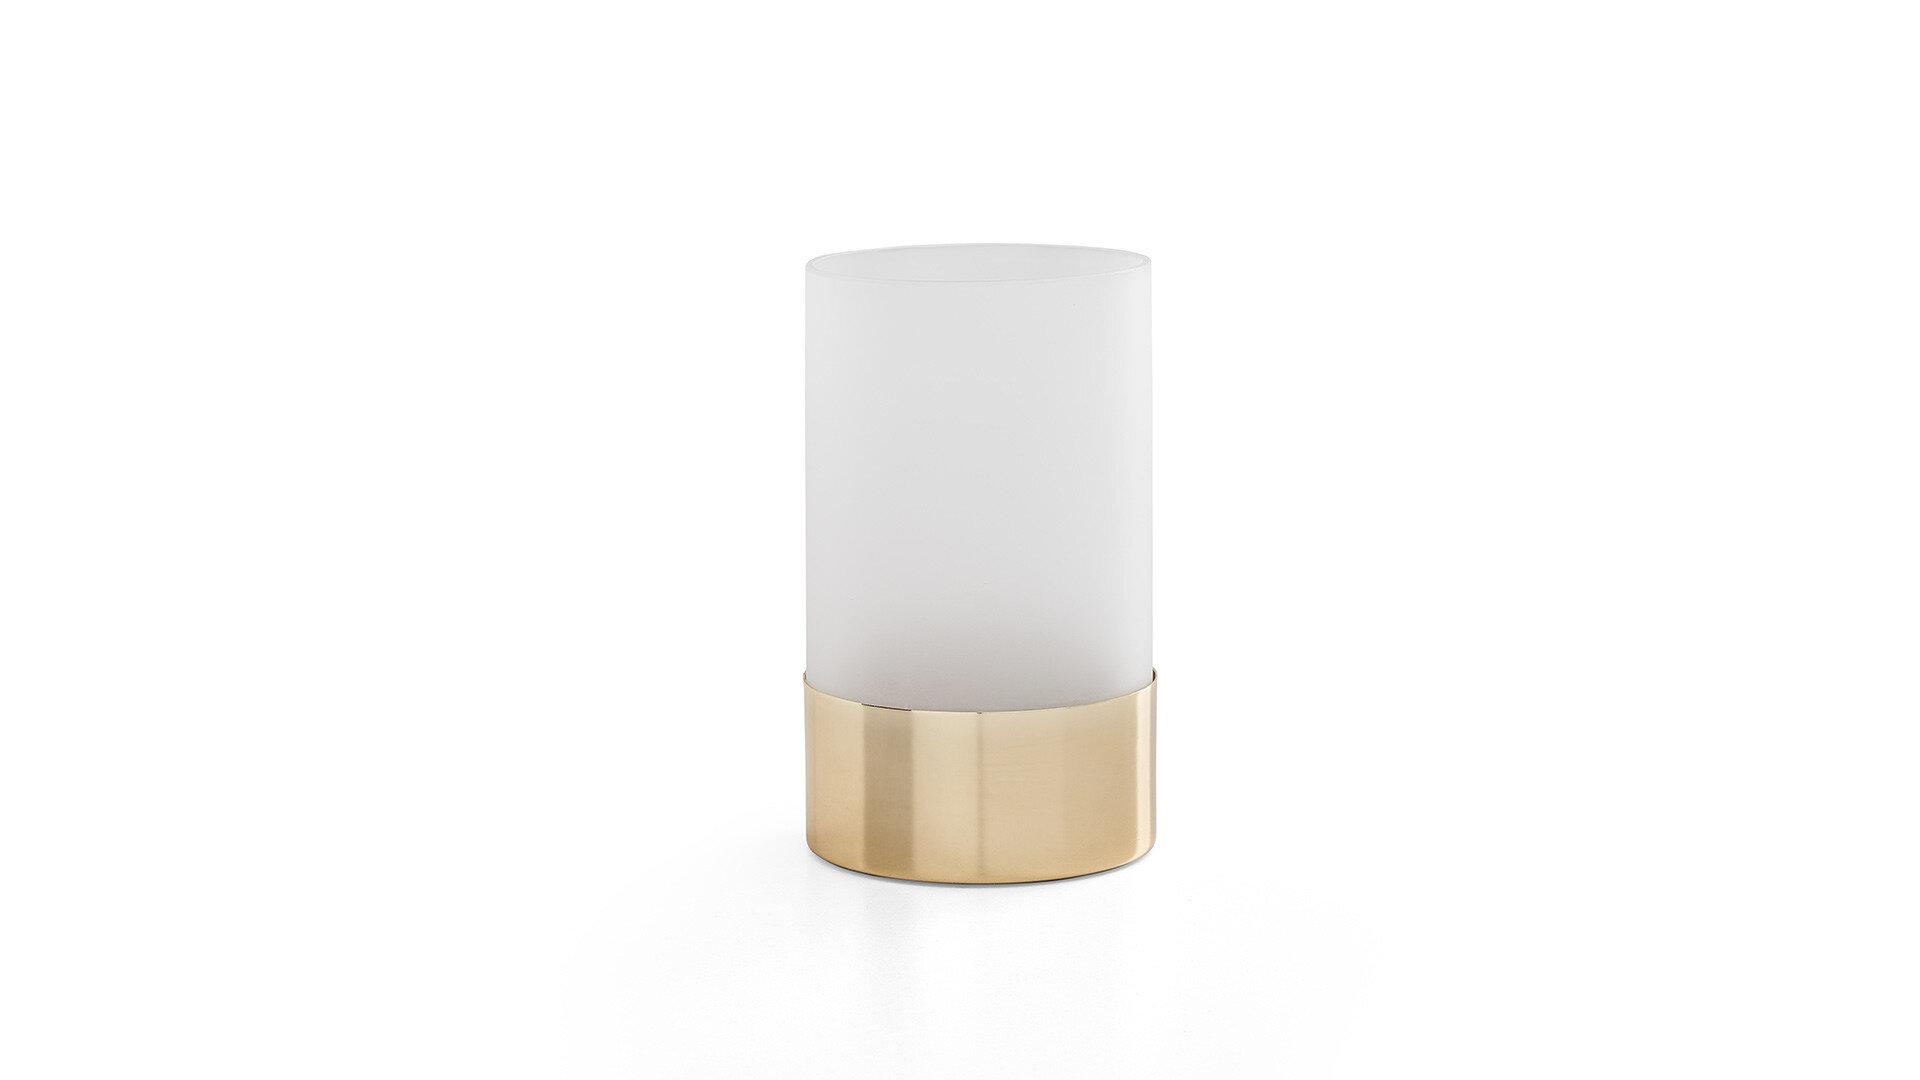 Lıkya Home-08 Buzlu Camlı Mat Altın Orta Vazo